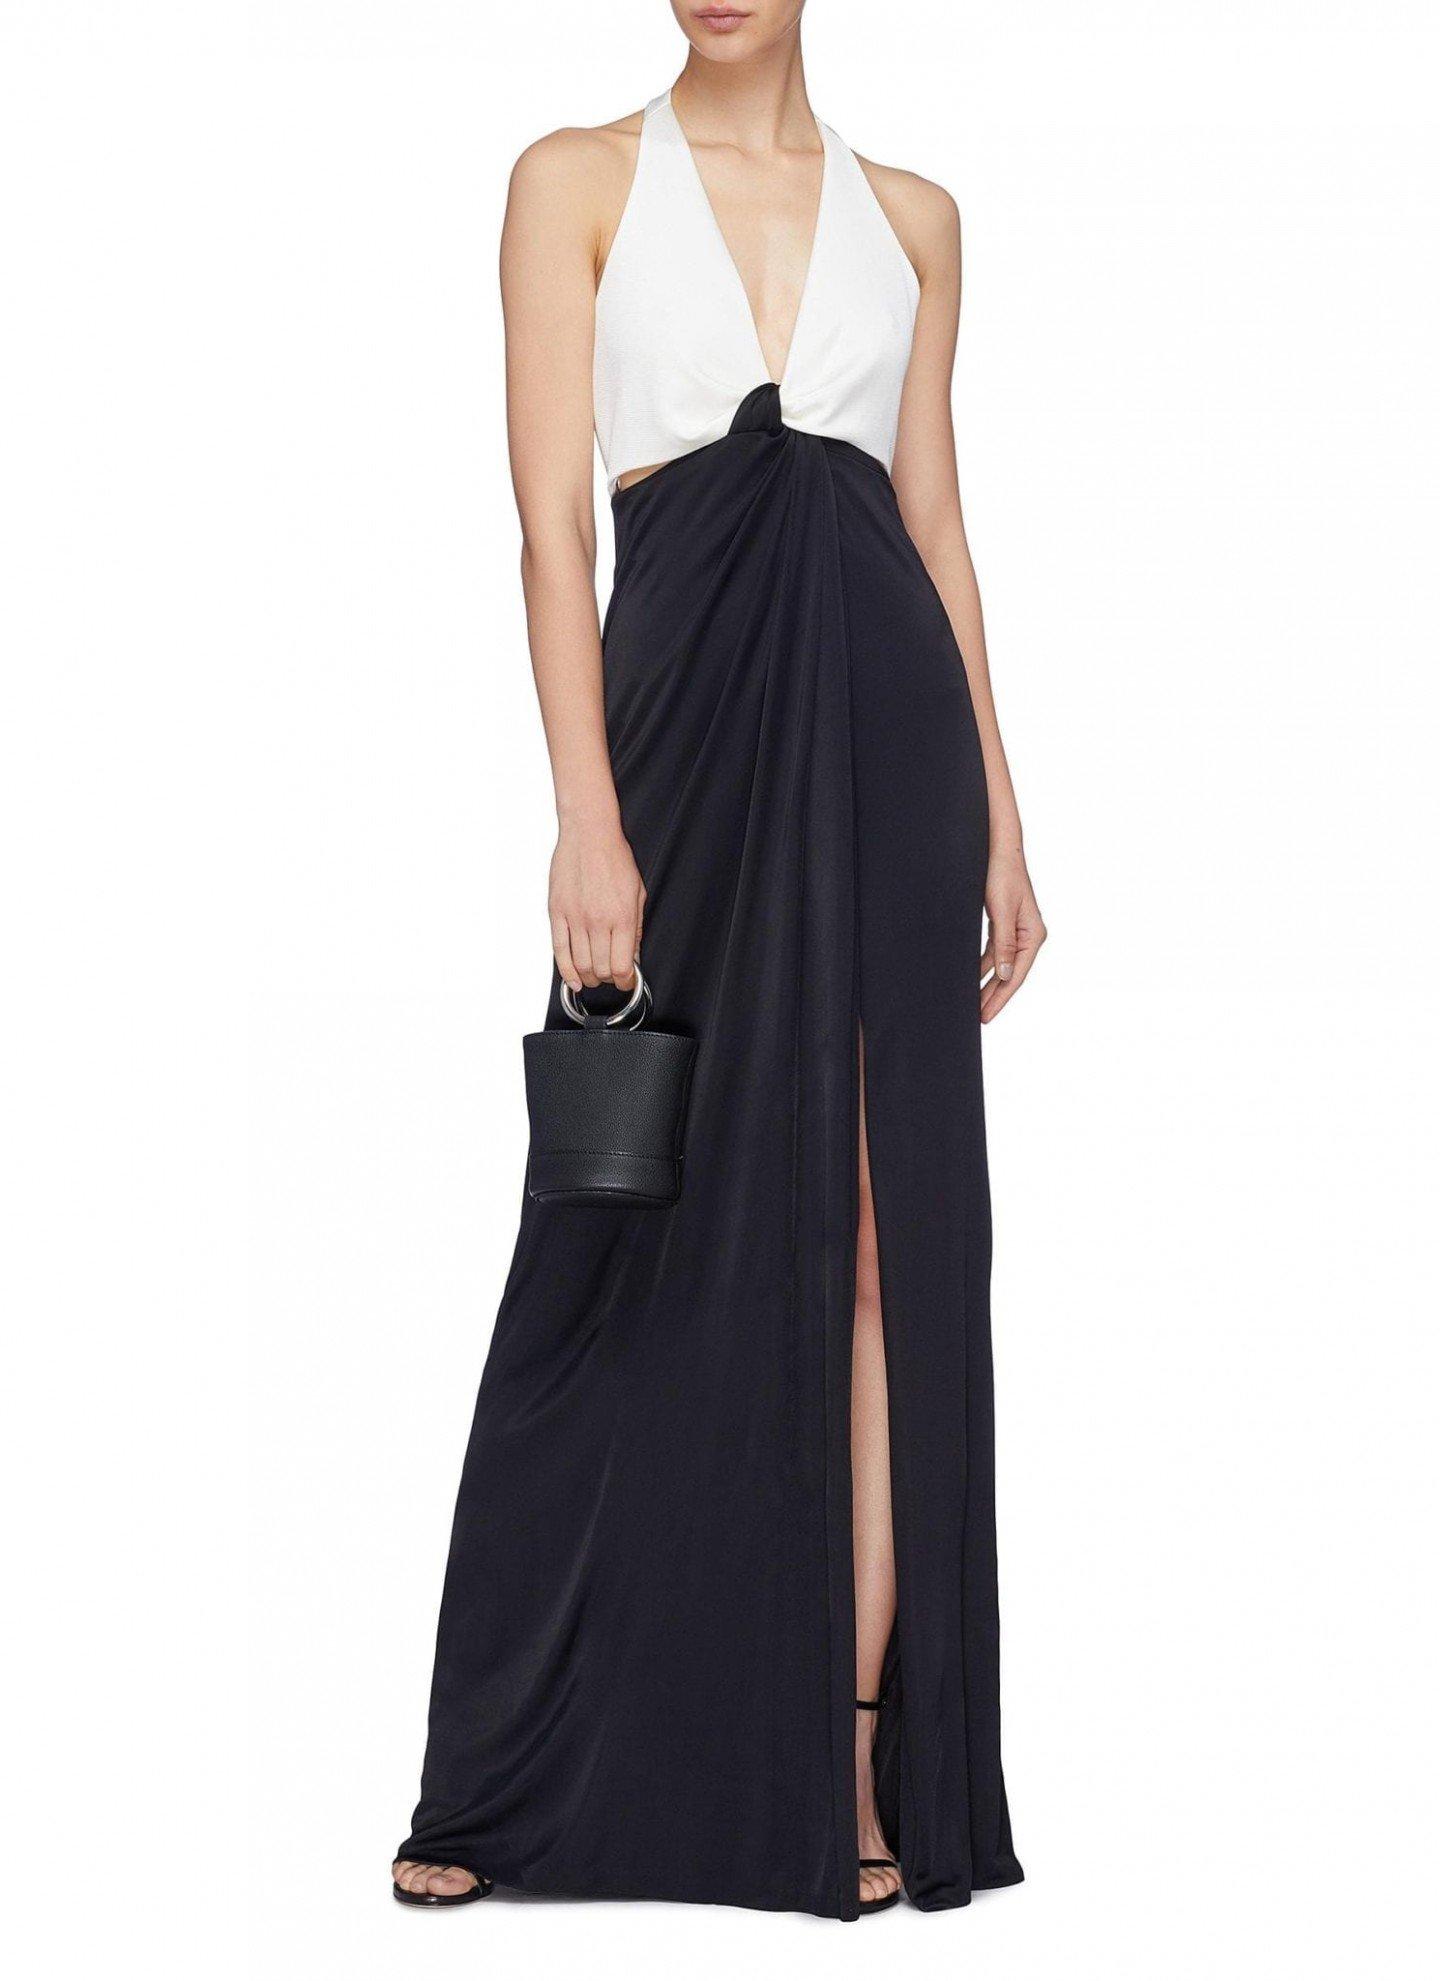 GALVAN LONDON 'Eclipse' Twist Front Cutout Halterneck Black-White Gown